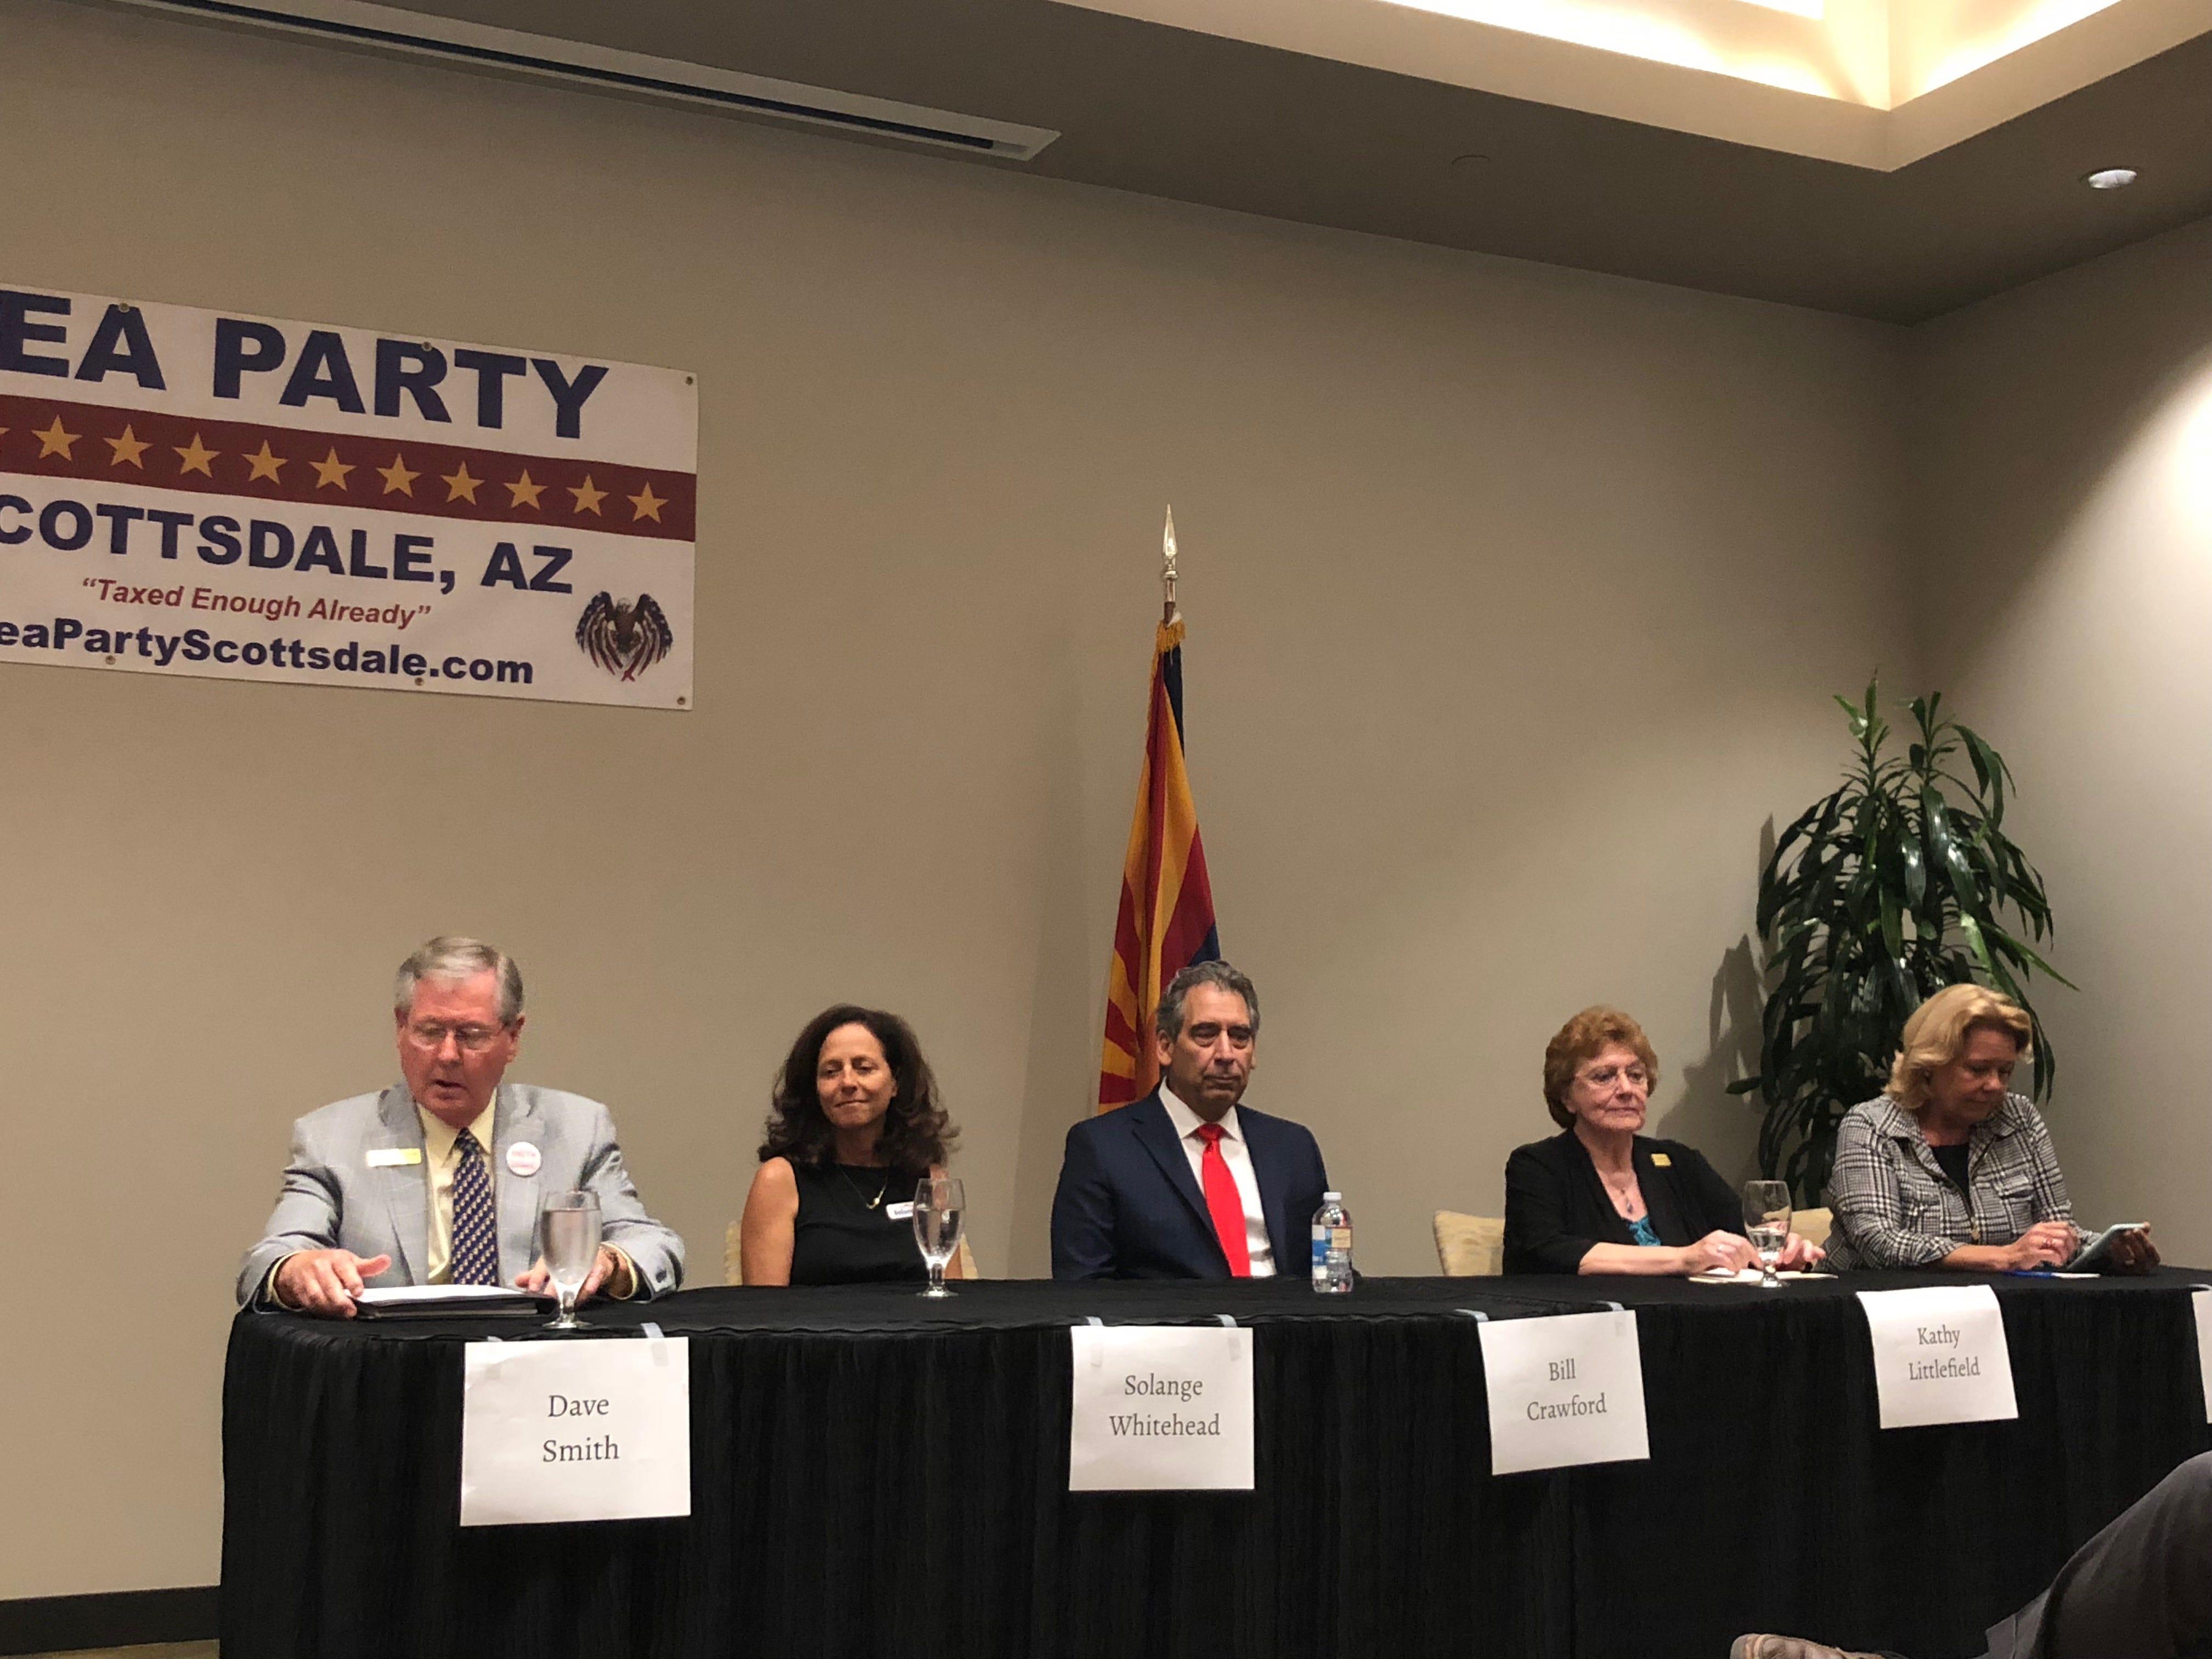 Prop. 420, development are top issues at Scottsdale City Council forum | AZ Central